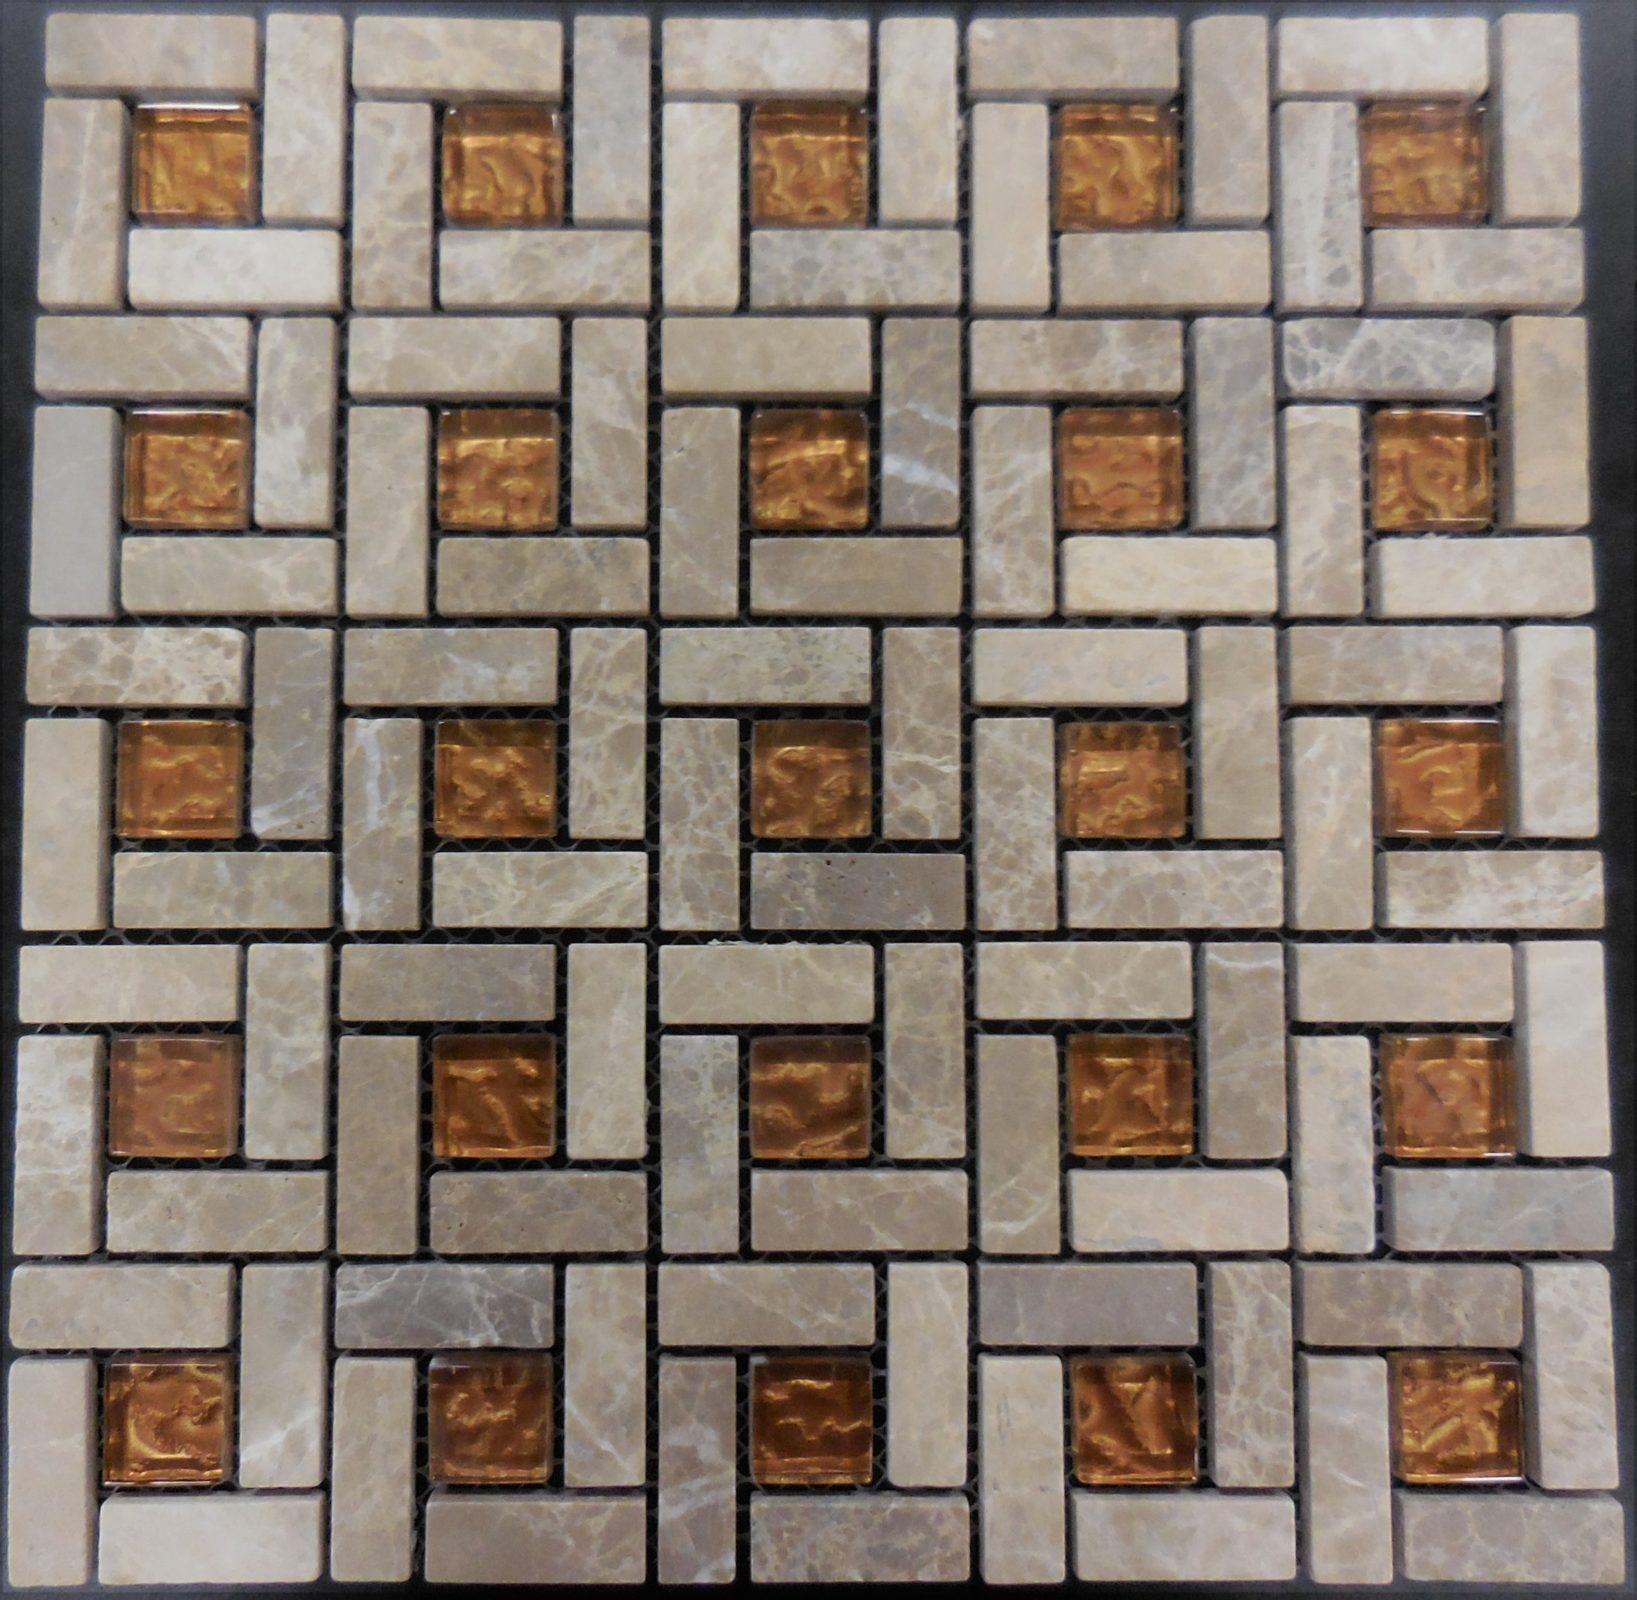 Al850 Stone Modular Series Pinwheel Pattern Glass And